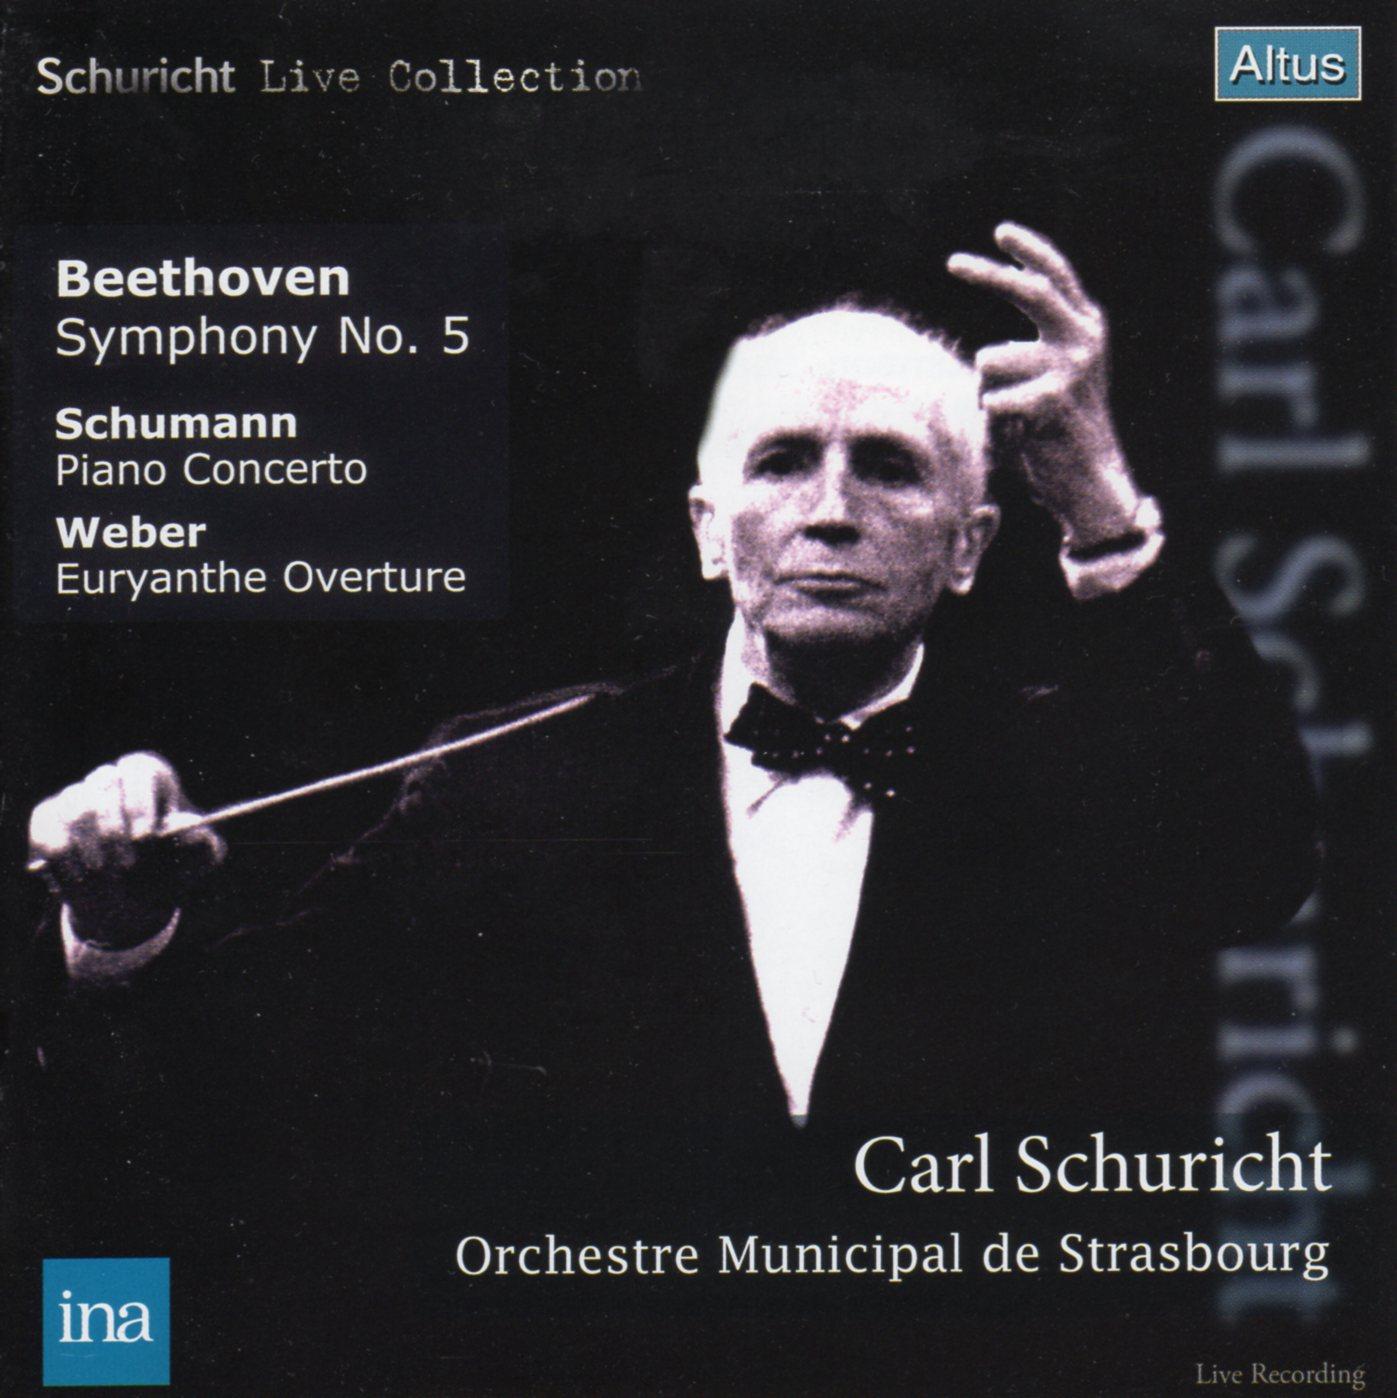 Schuricht_Orchestre Municipal de Strasbourg_Beethoven Symphony #5